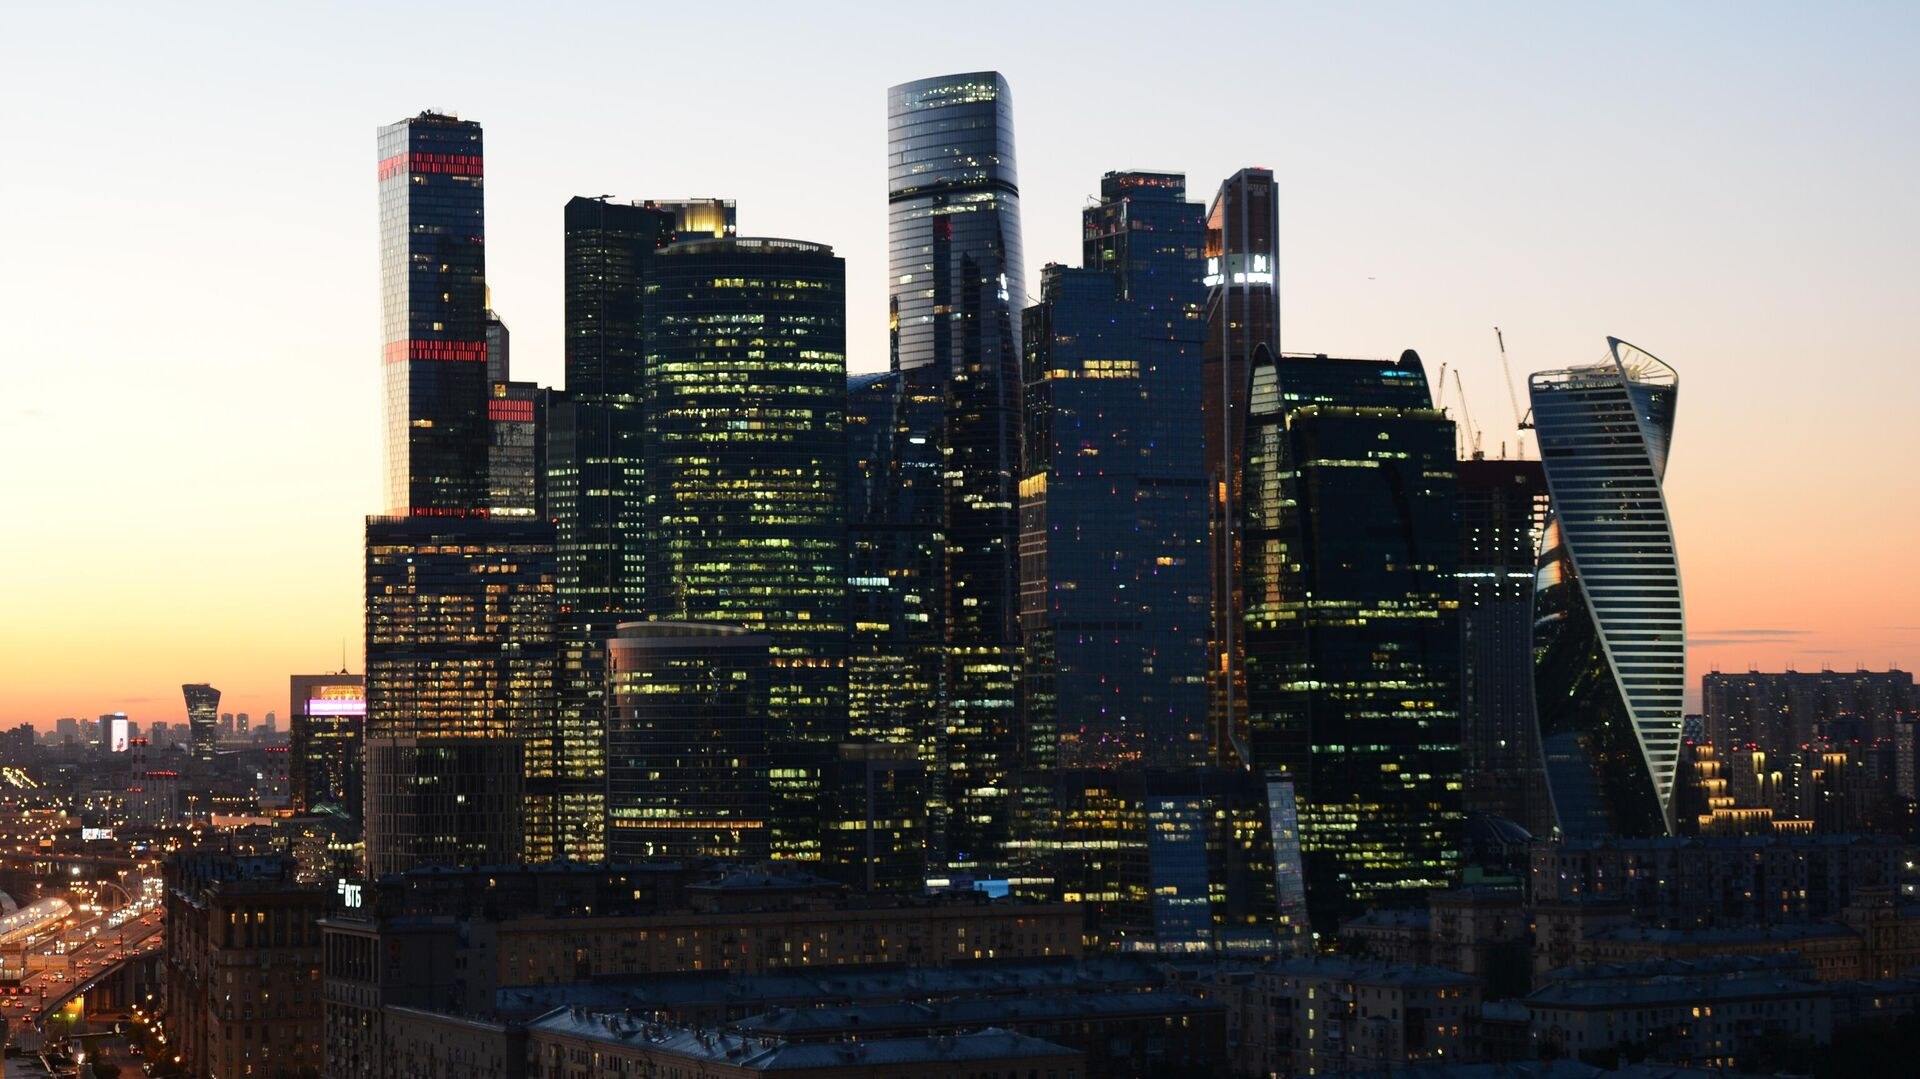 Вид на здания делового центра Москва-сити в Москве - РИА Новости, 1920, 22.09.2021